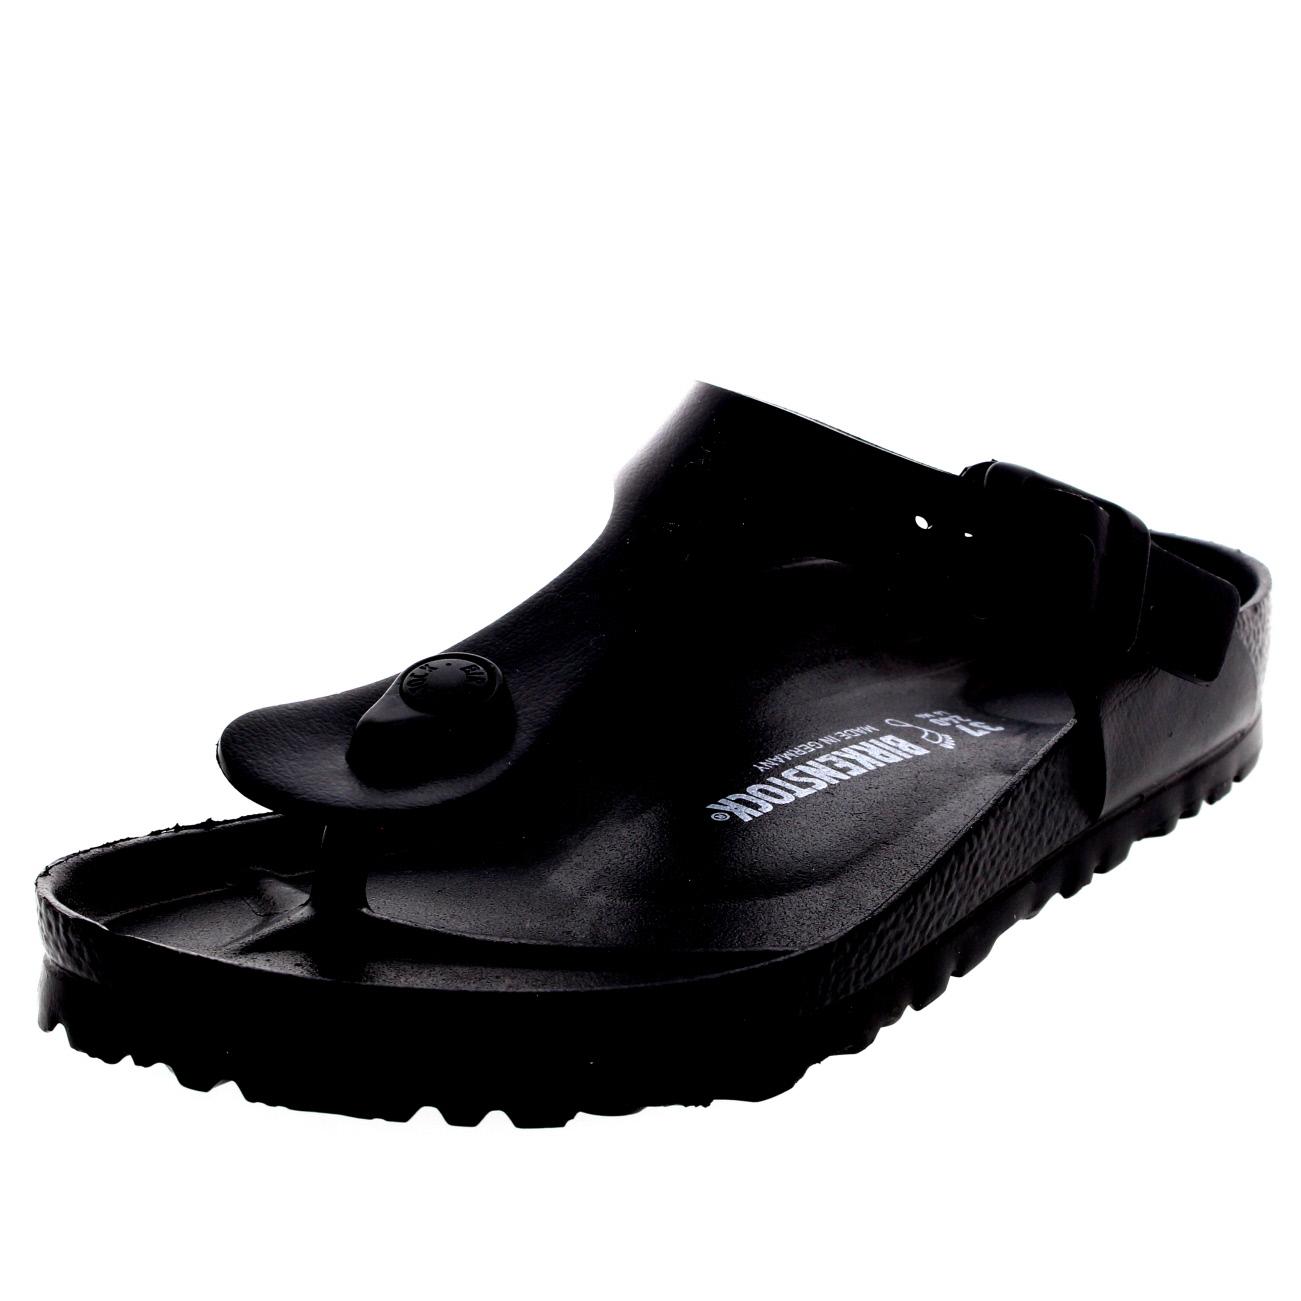 Unisex-Adults-Birkenstock-Gizeh-Summer-EVA-Toe-Post-Beach-Flat-Sandals-All-Sizes thumbnail 14